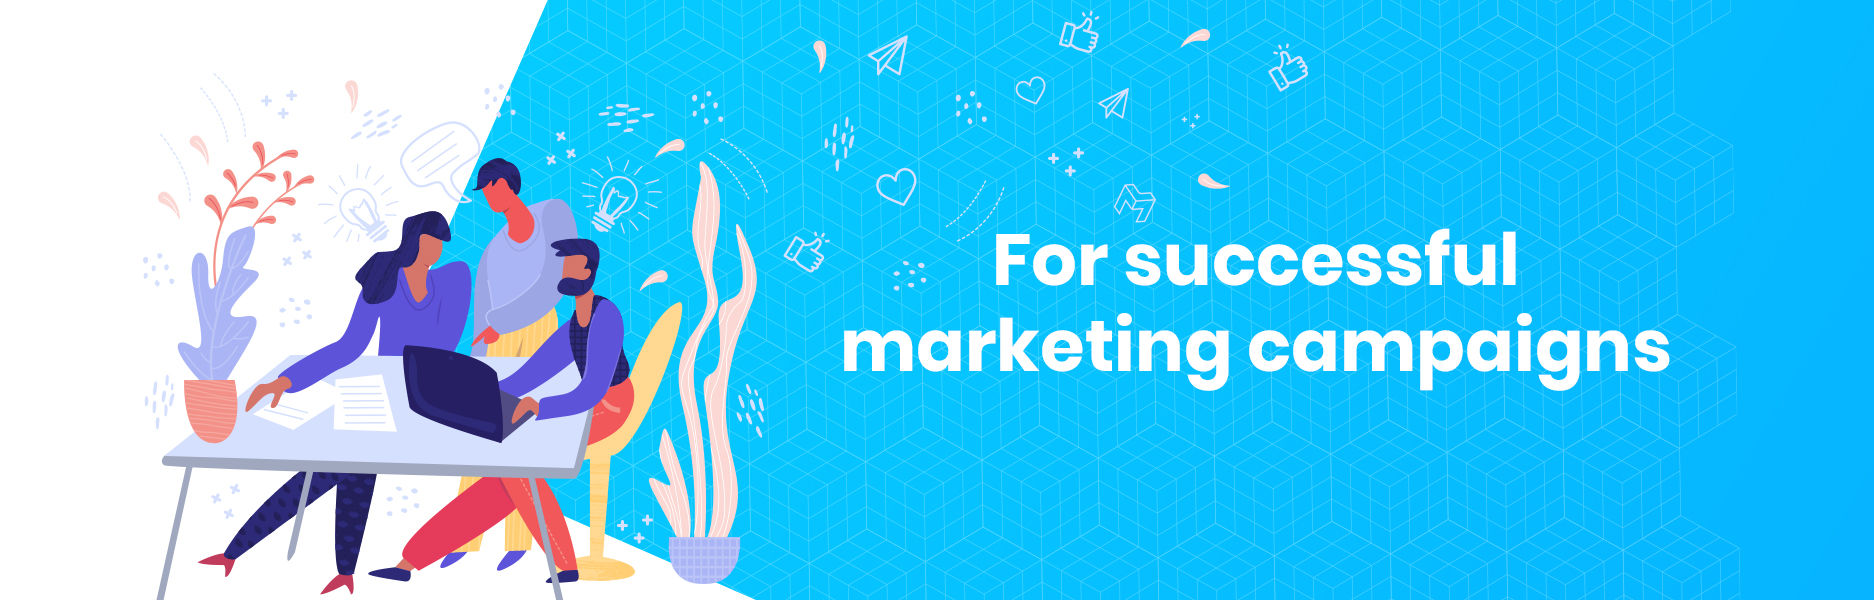 WordPress Newsletter & Marketing Automation – AcyMailing Plugin Banner Image